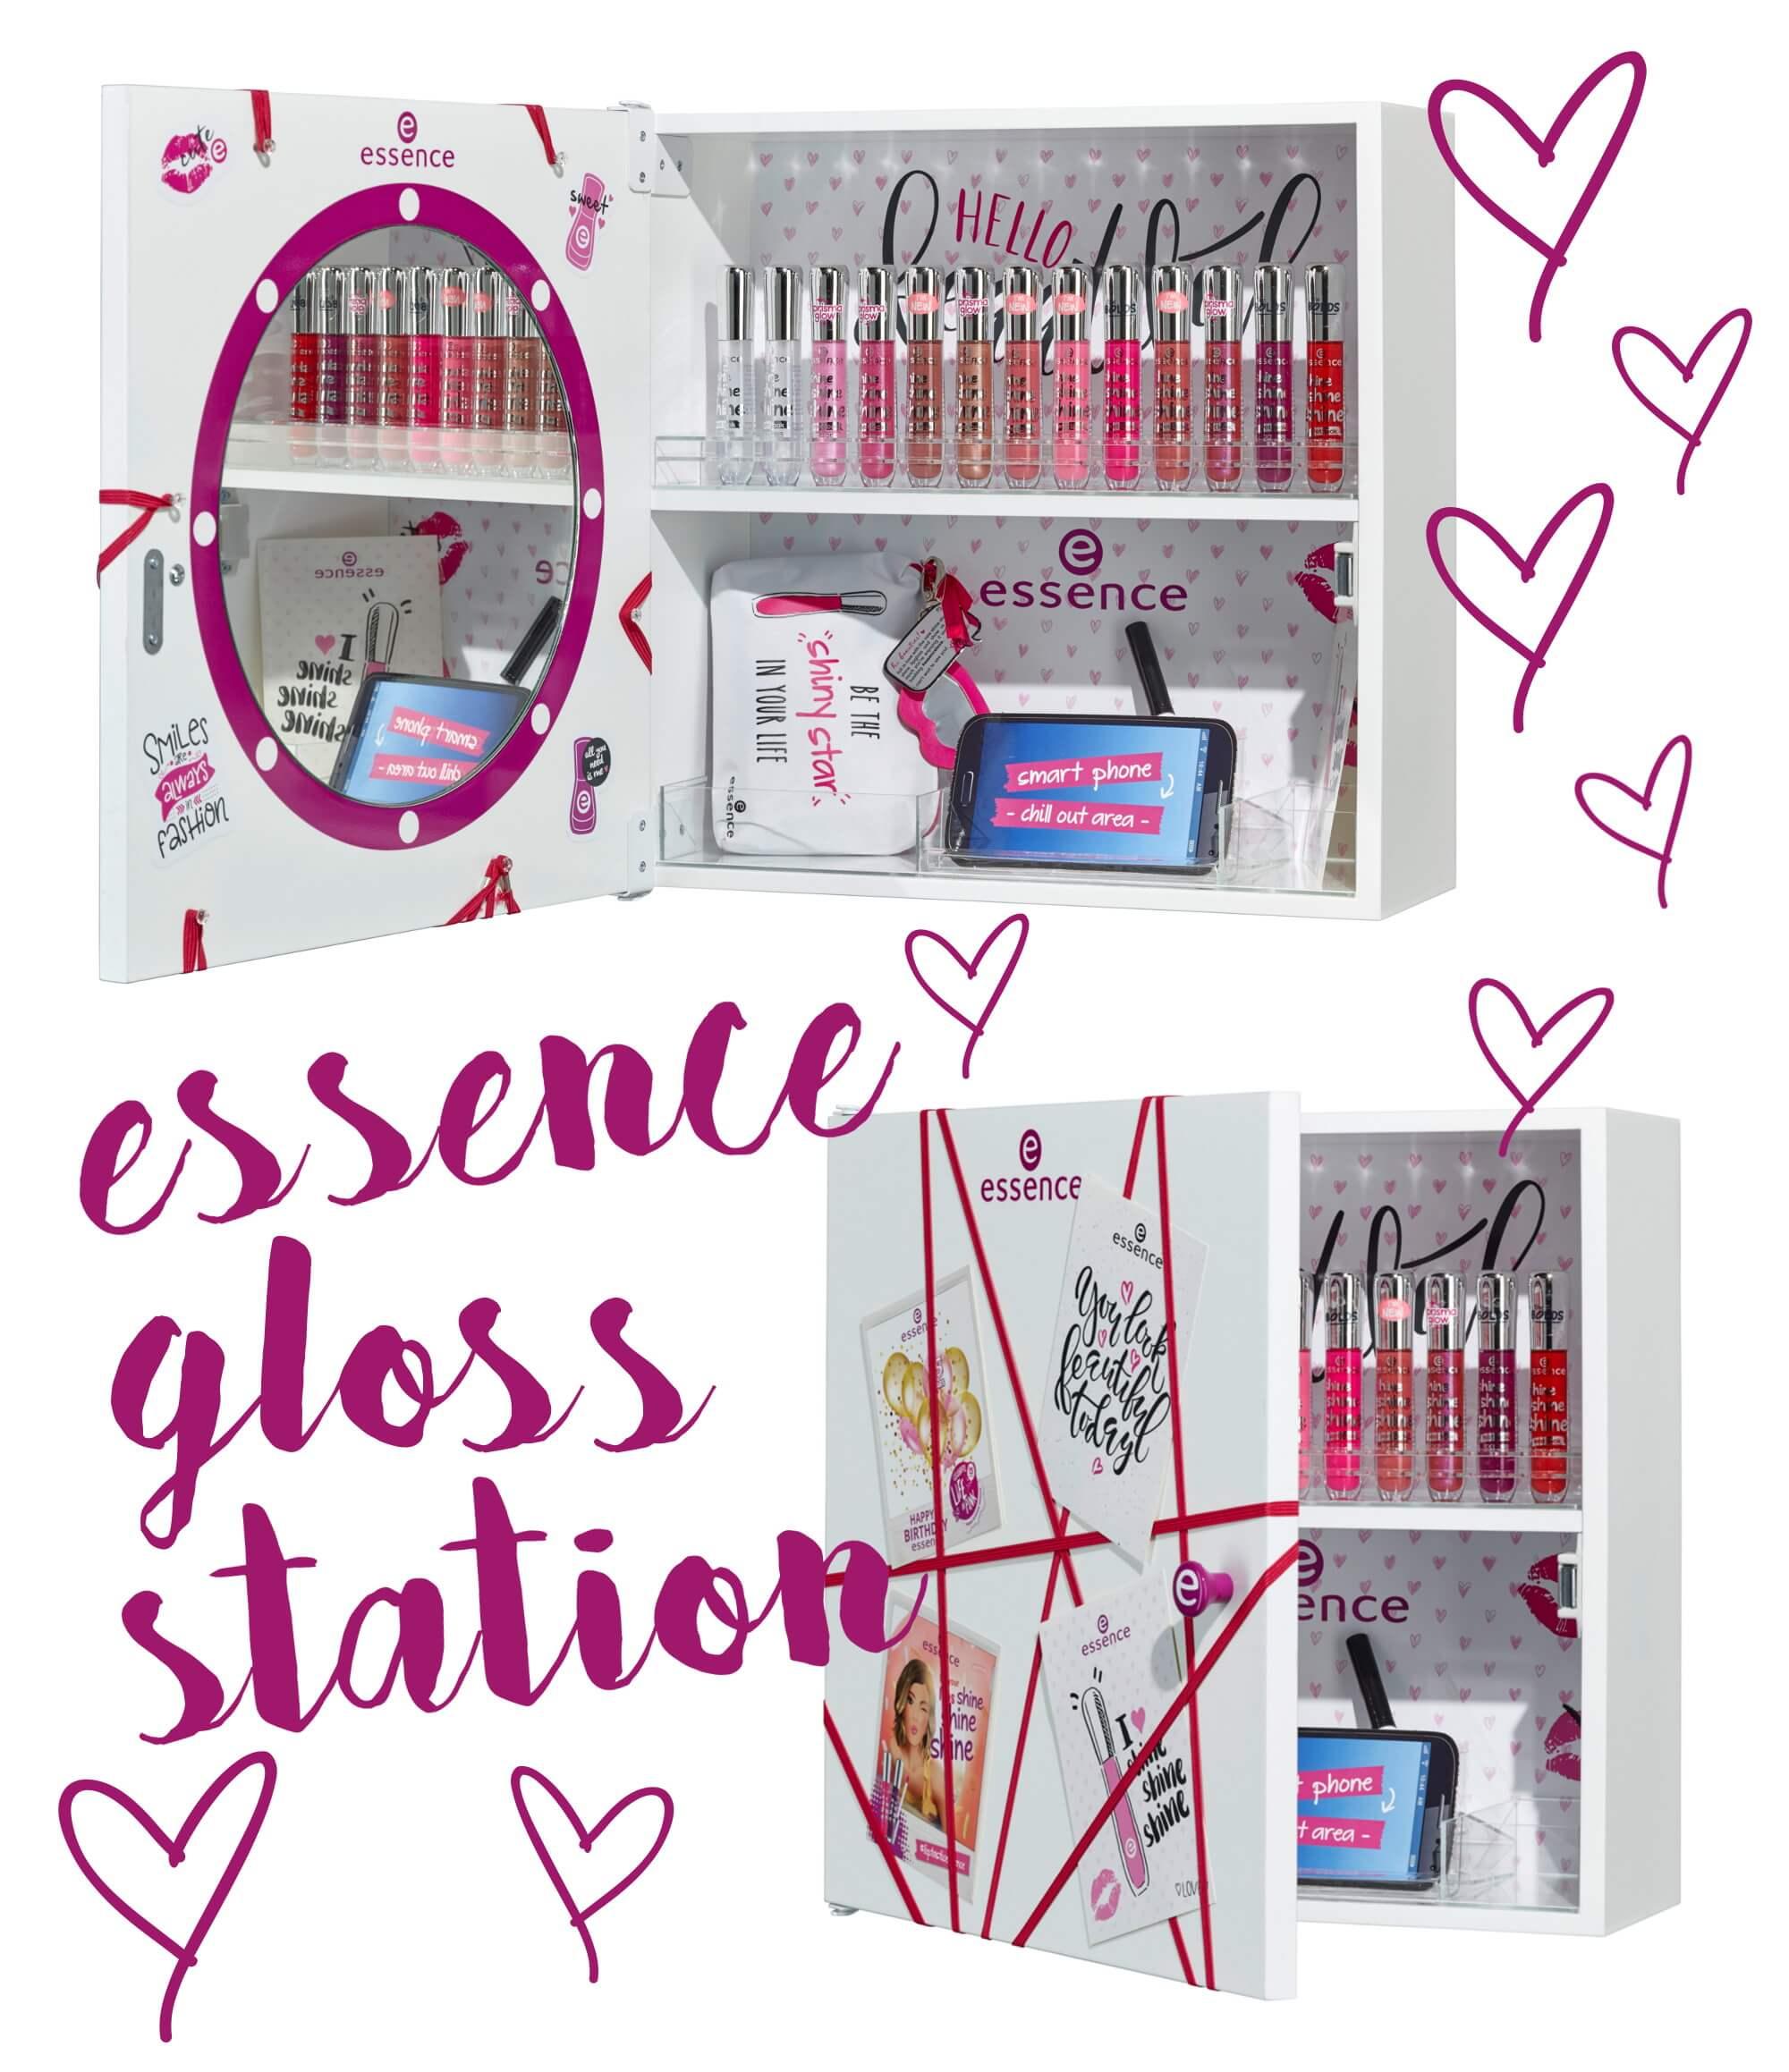 essence gloss station gewinnspiel tantedine. Black Bedroom Furniture Sets. Home Design Ideas